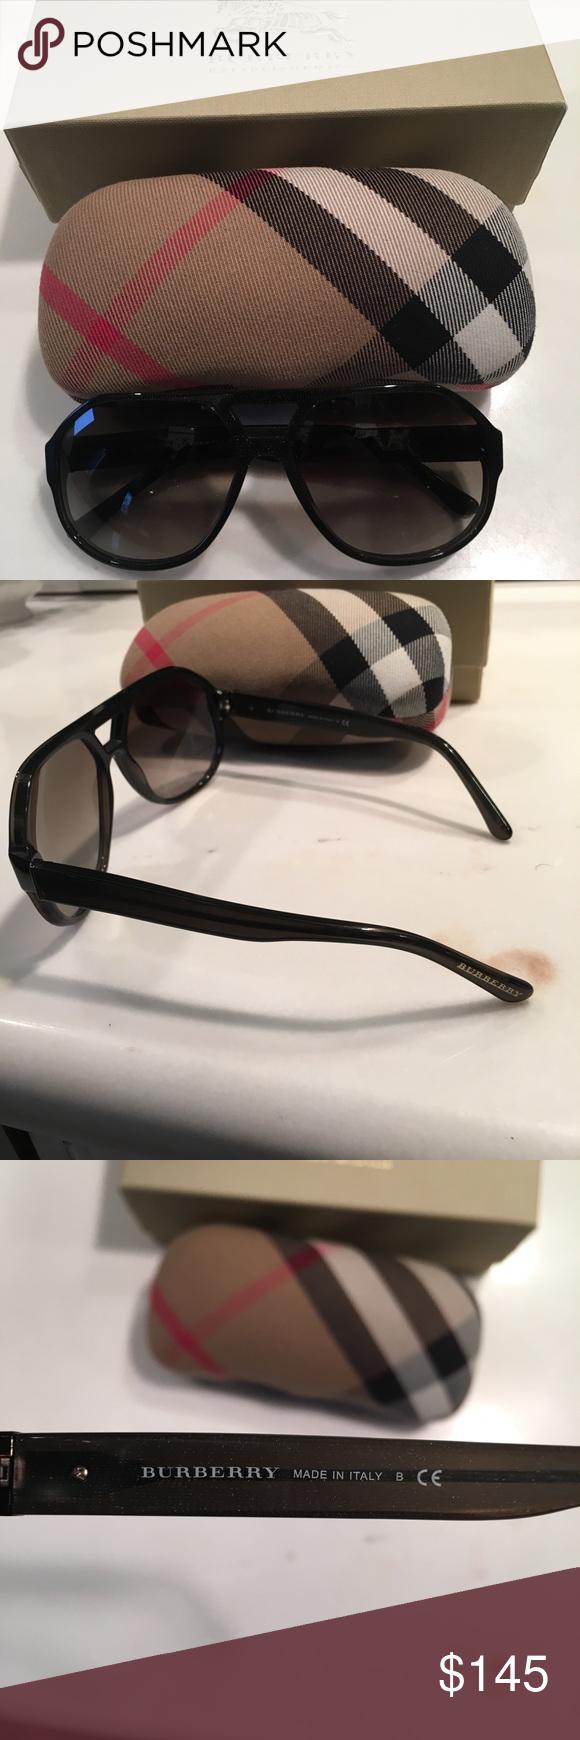 de4b621c8437 BURBERRY B 4091 3227 13 UNISEX SUNGLASSES Burberry unisex sunglasses. Model  number B 4091